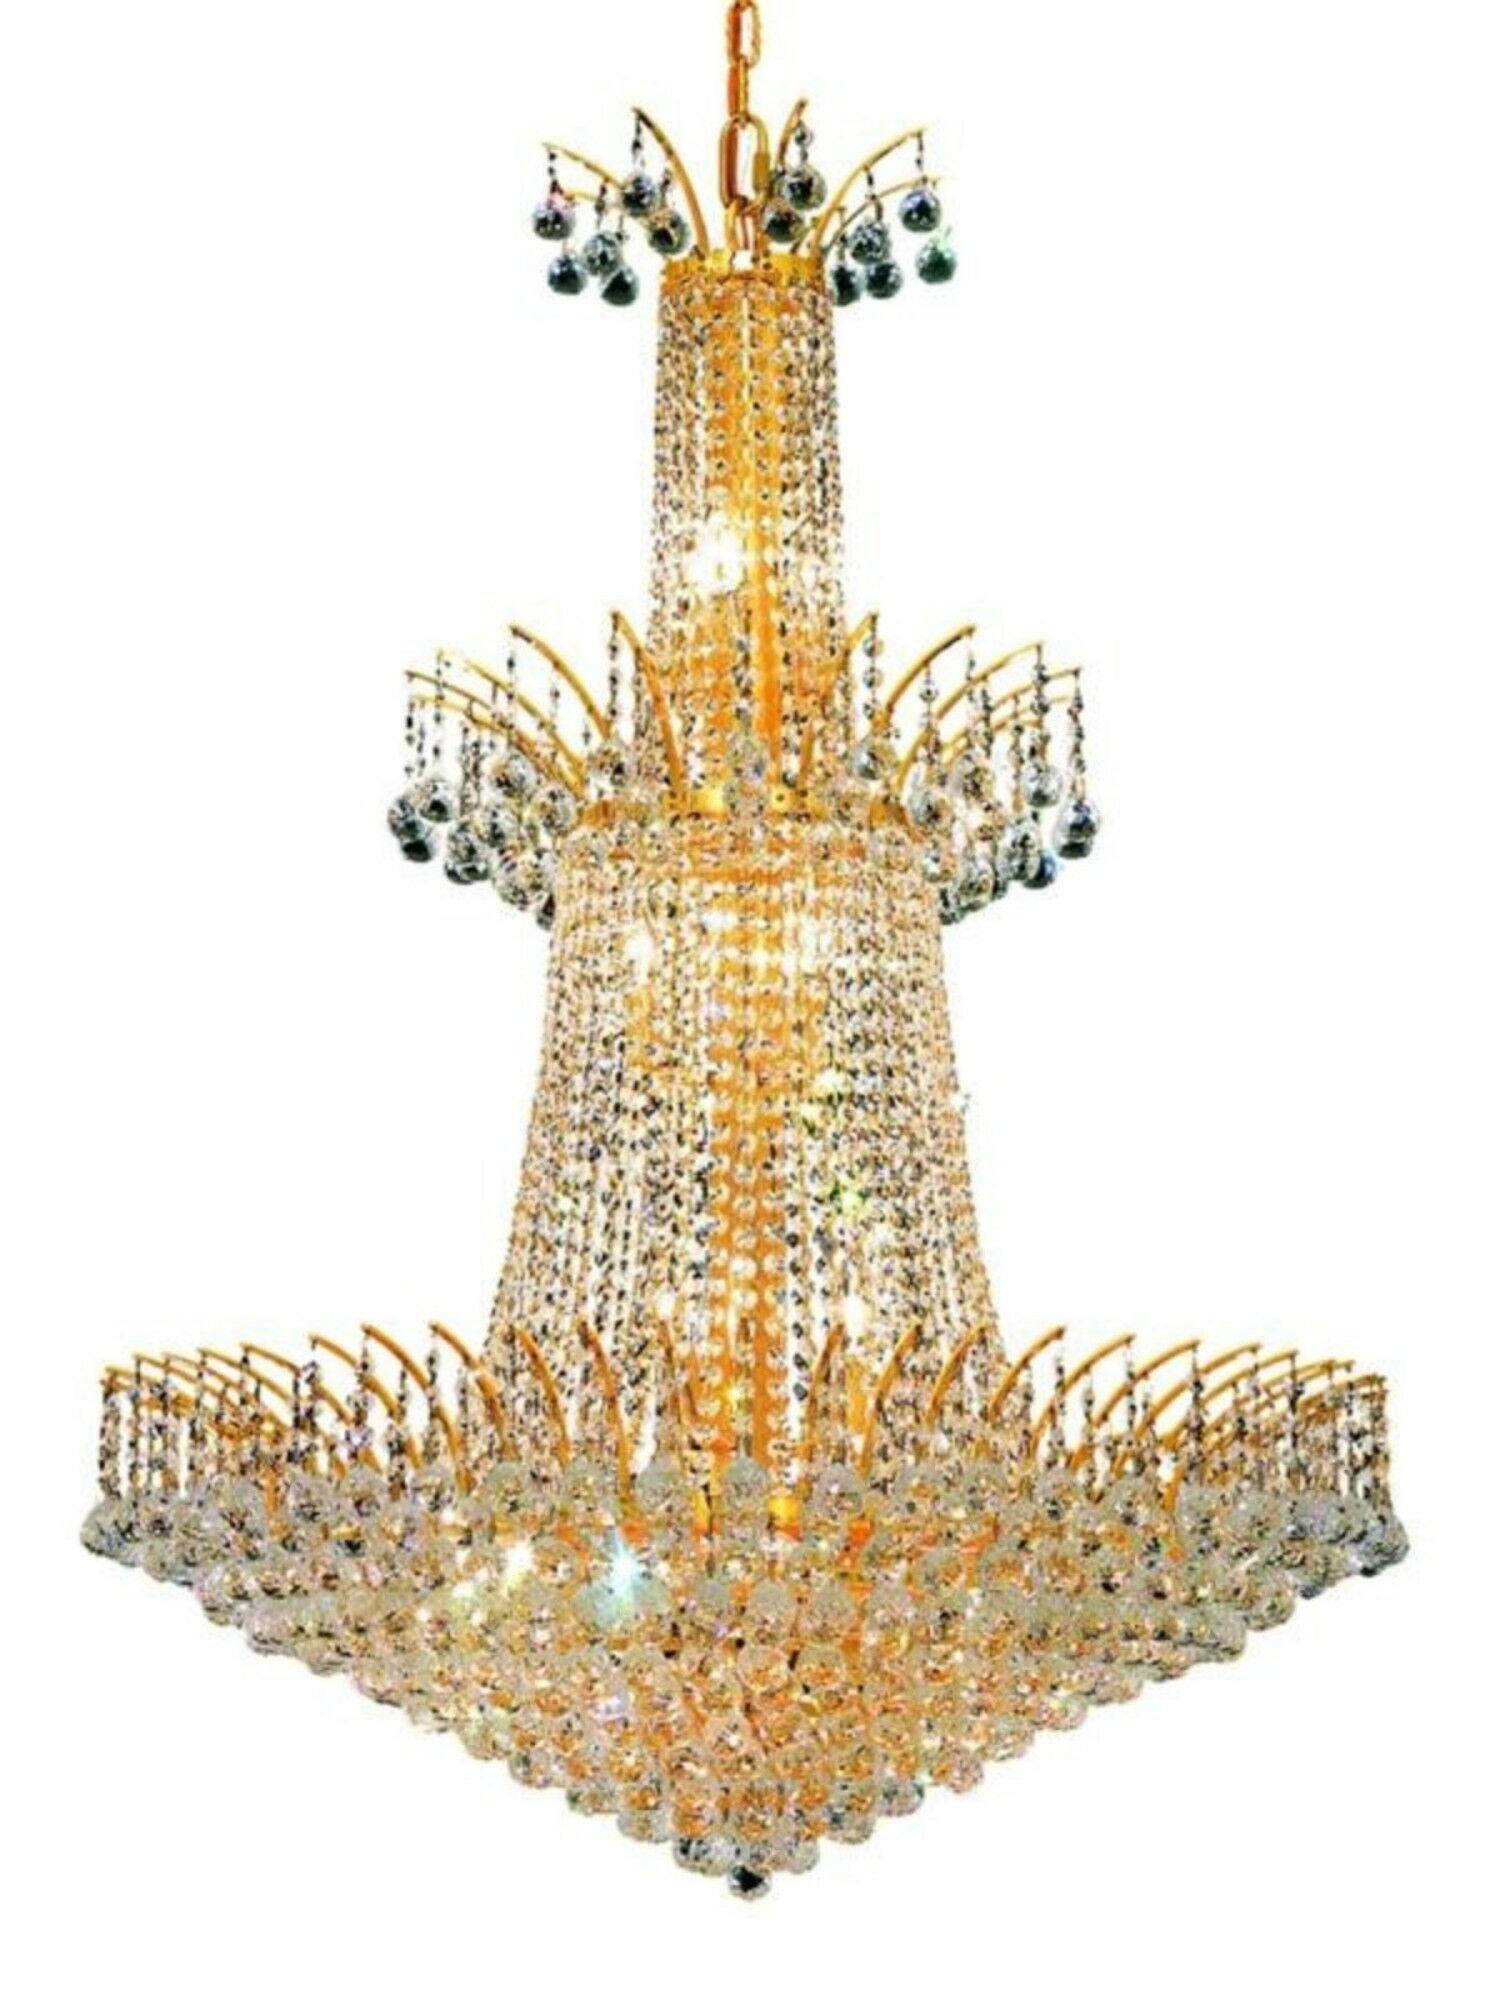 Phyllida 18-Light Crystal Chandelier Finish: Gold, Crystal: Spectra Swarovski